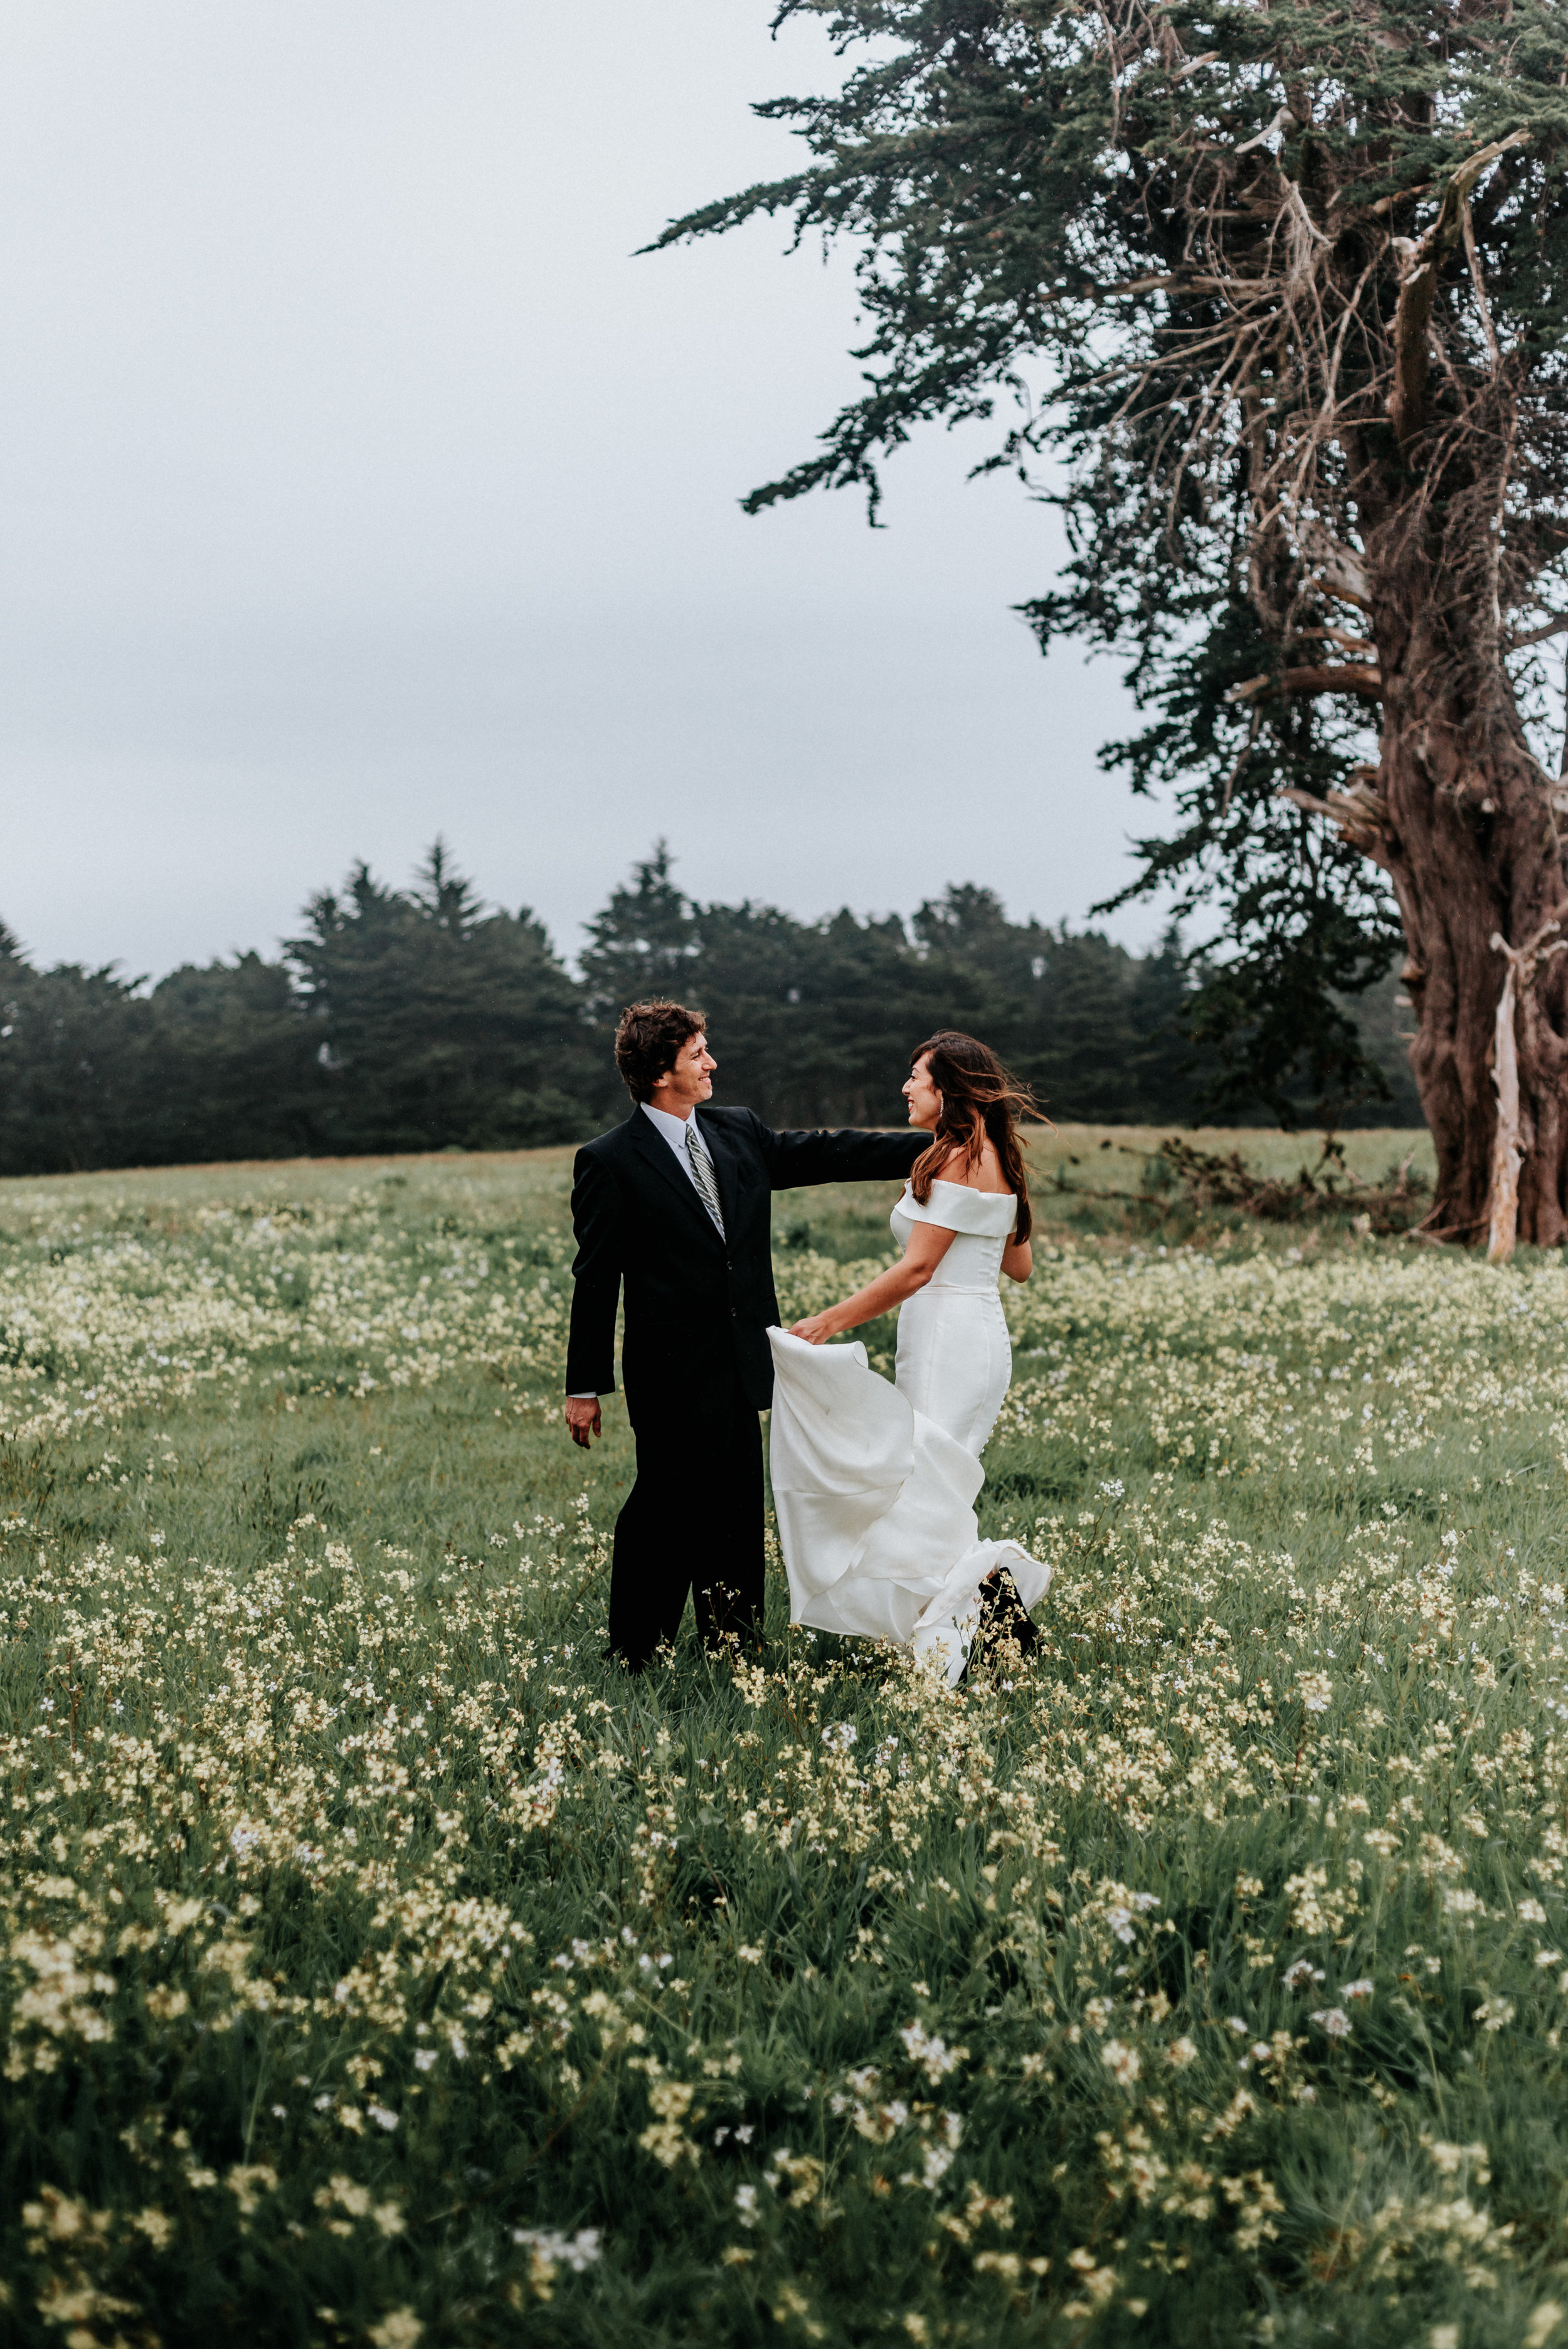 Albion River Inn Wedding in Albion Caliornia-23.jpg